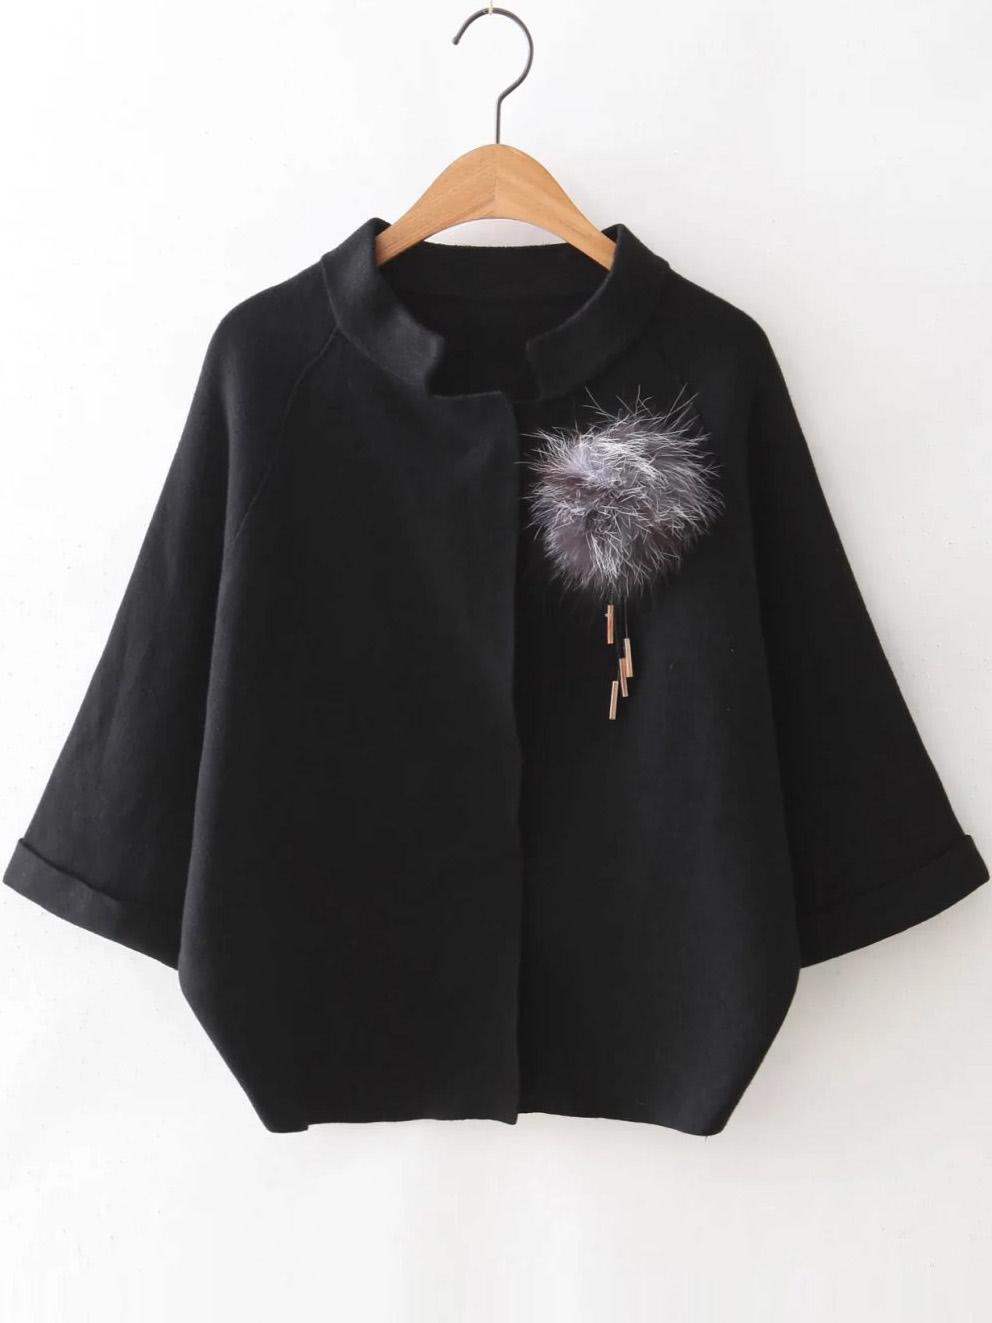 Black Raglan Sleeve Sweater Coat With Brooch